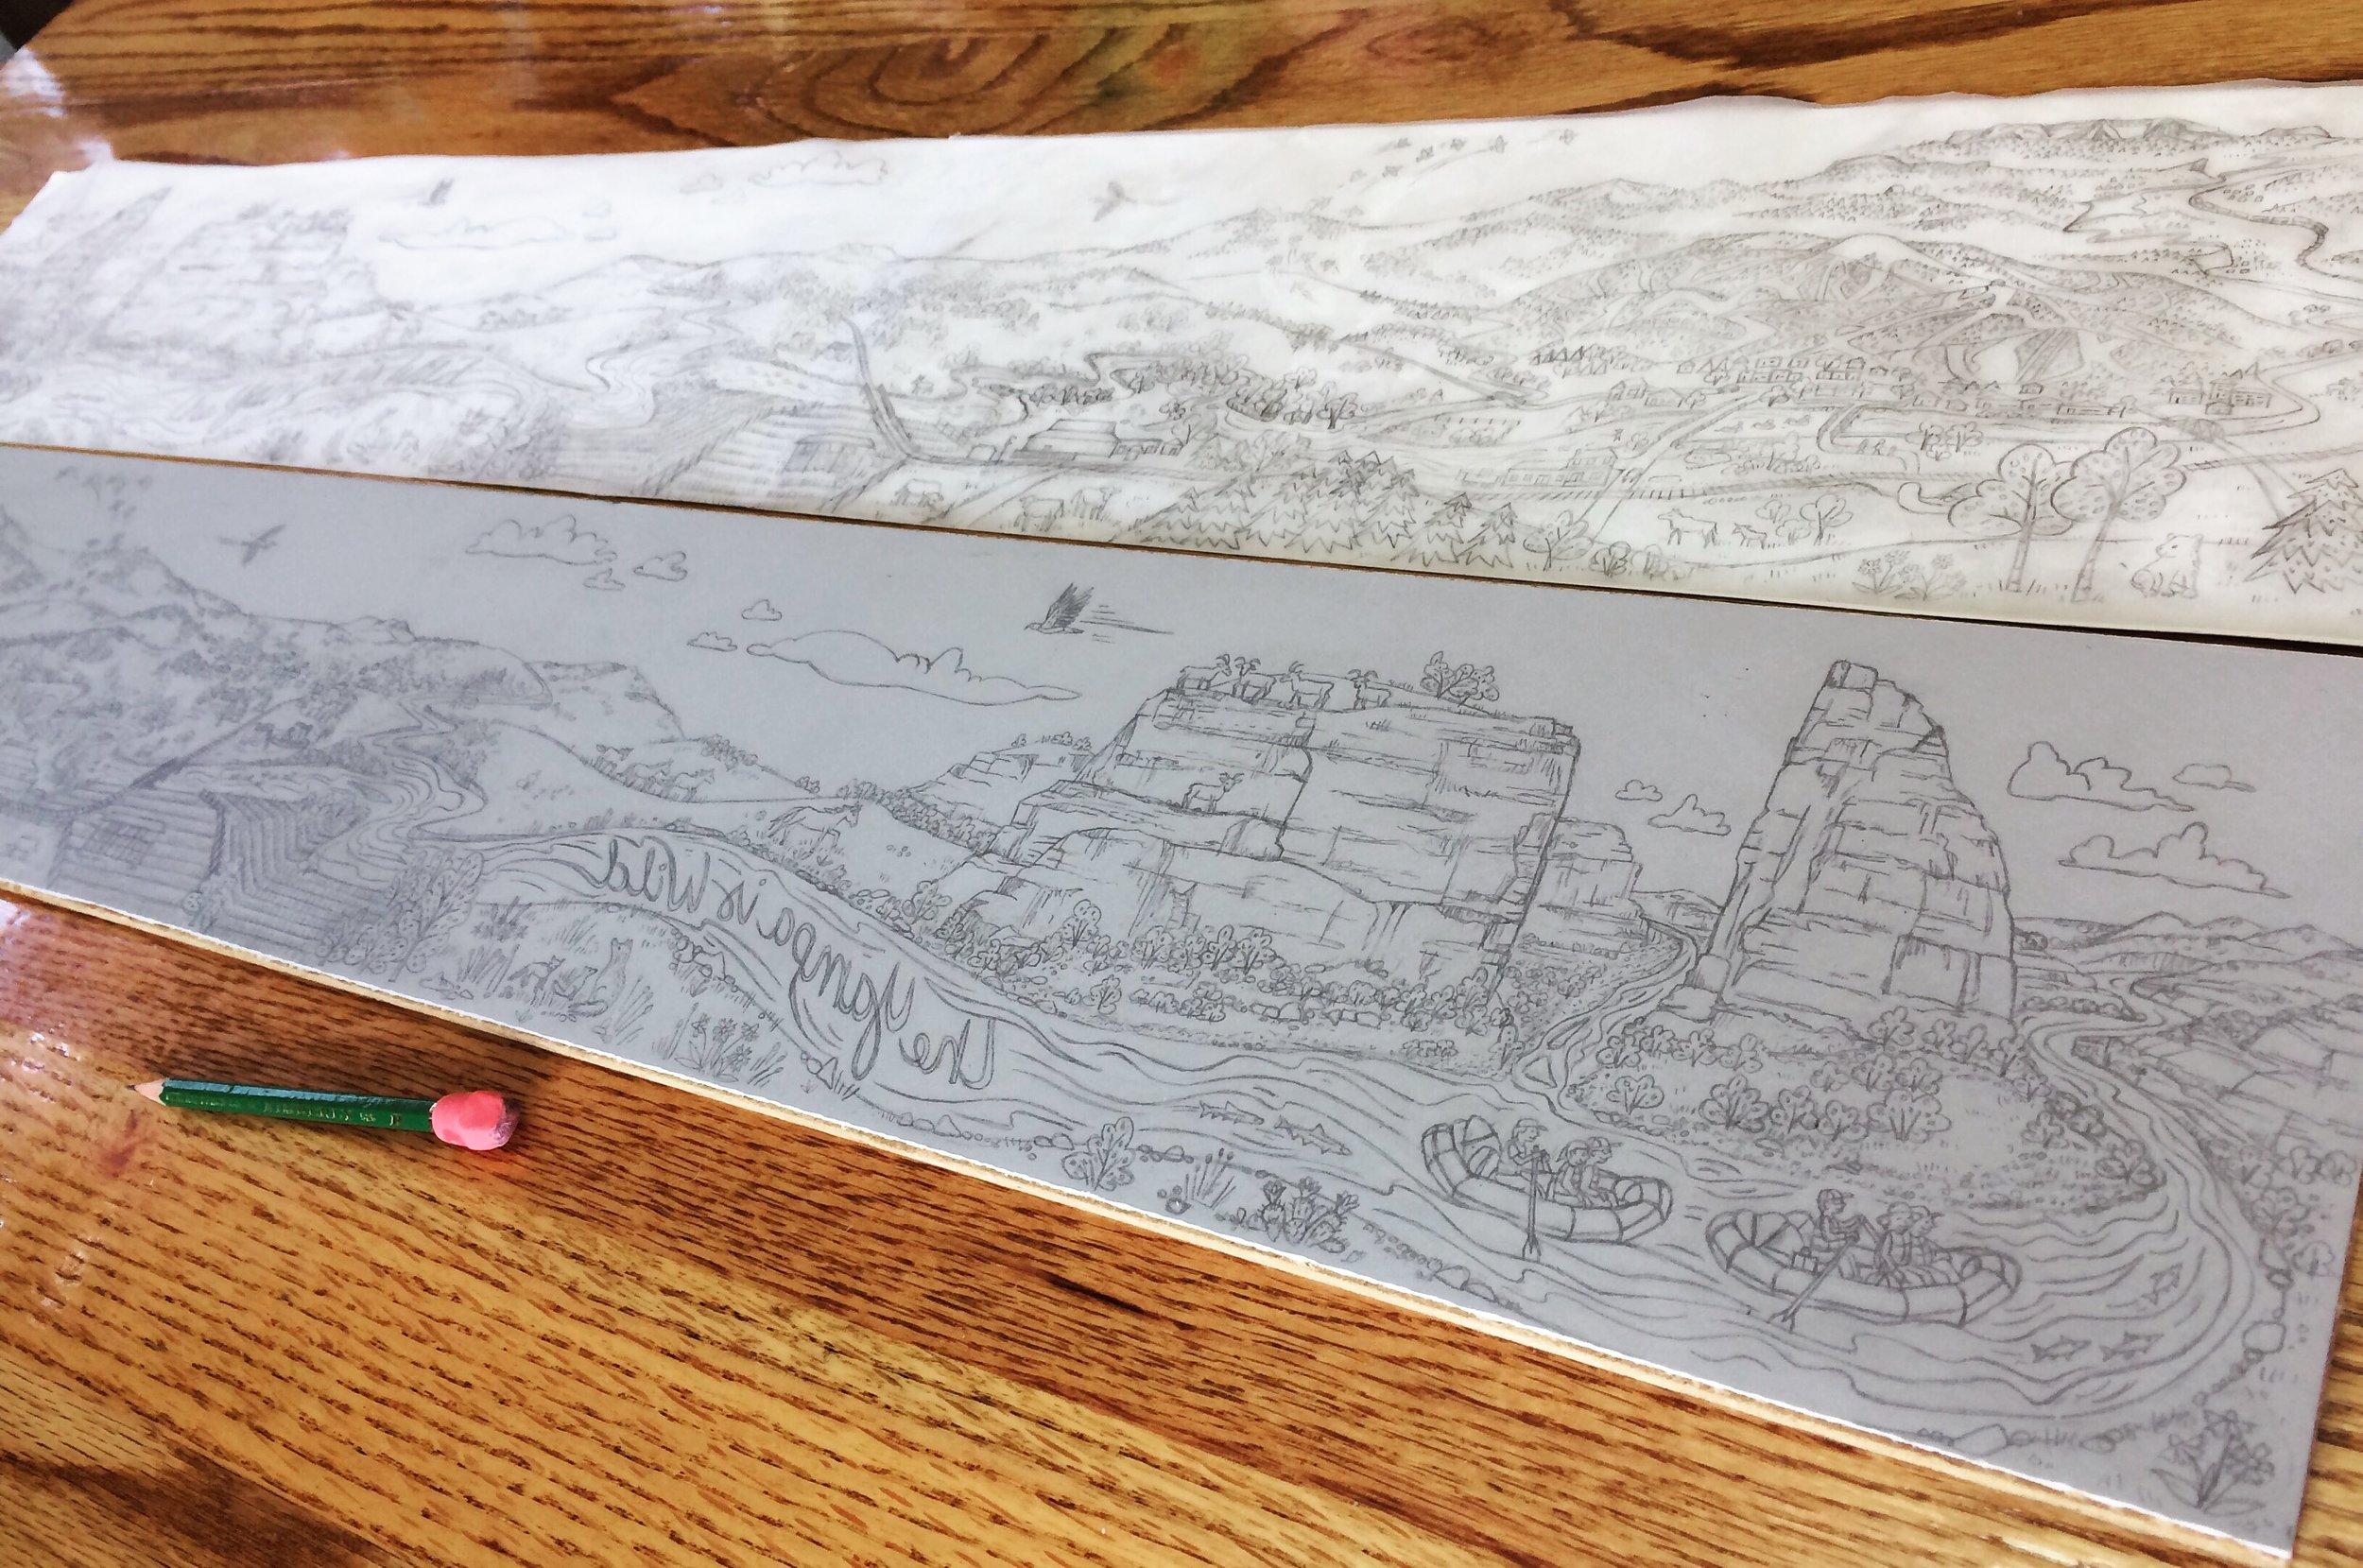 River drawing on block.JPG